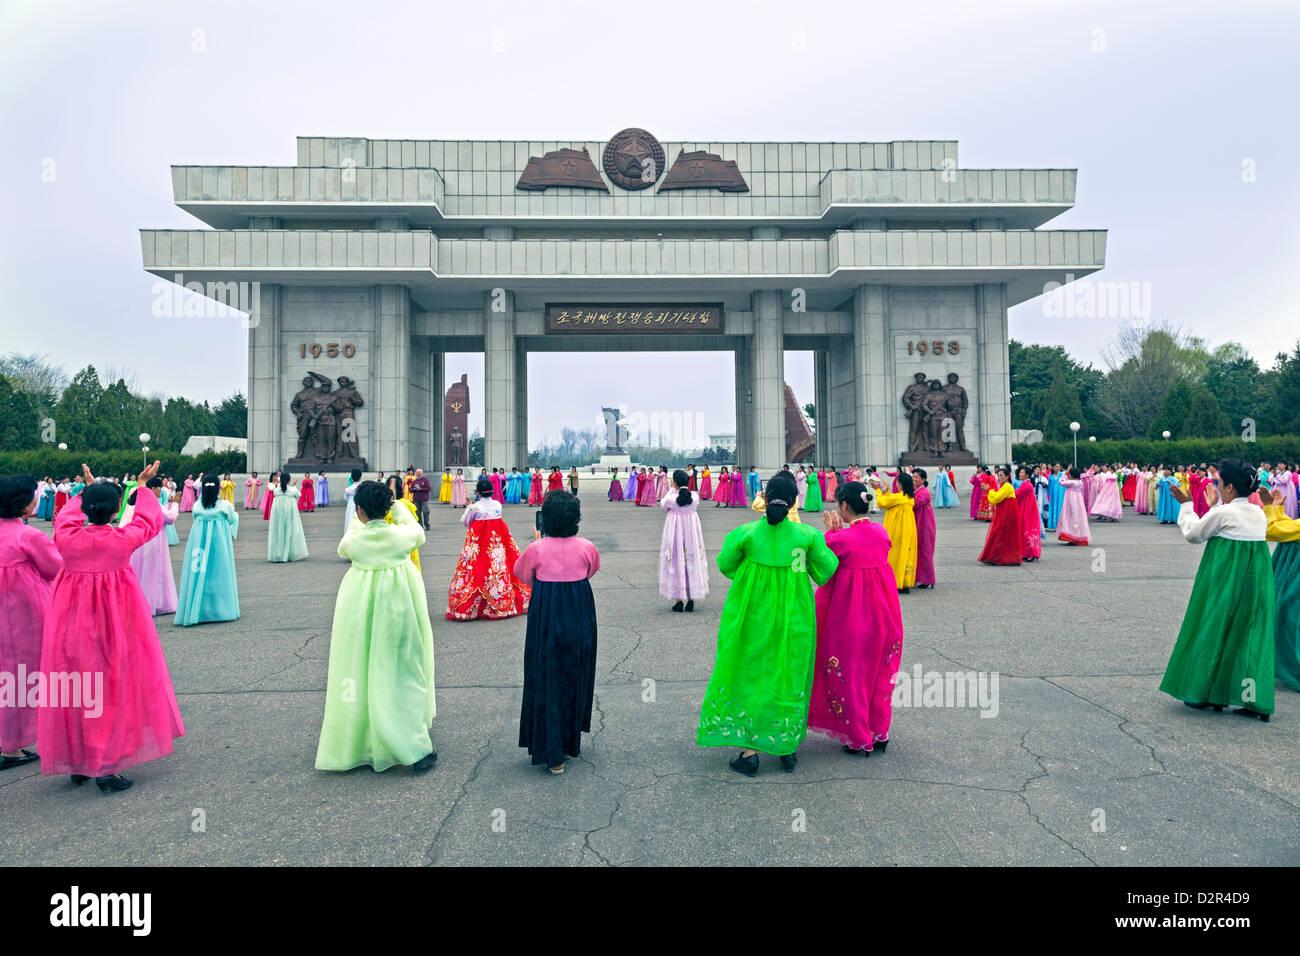 Women in colourful traditional dresses at mass dancing, Pyongyang, North Korea - Stock Image